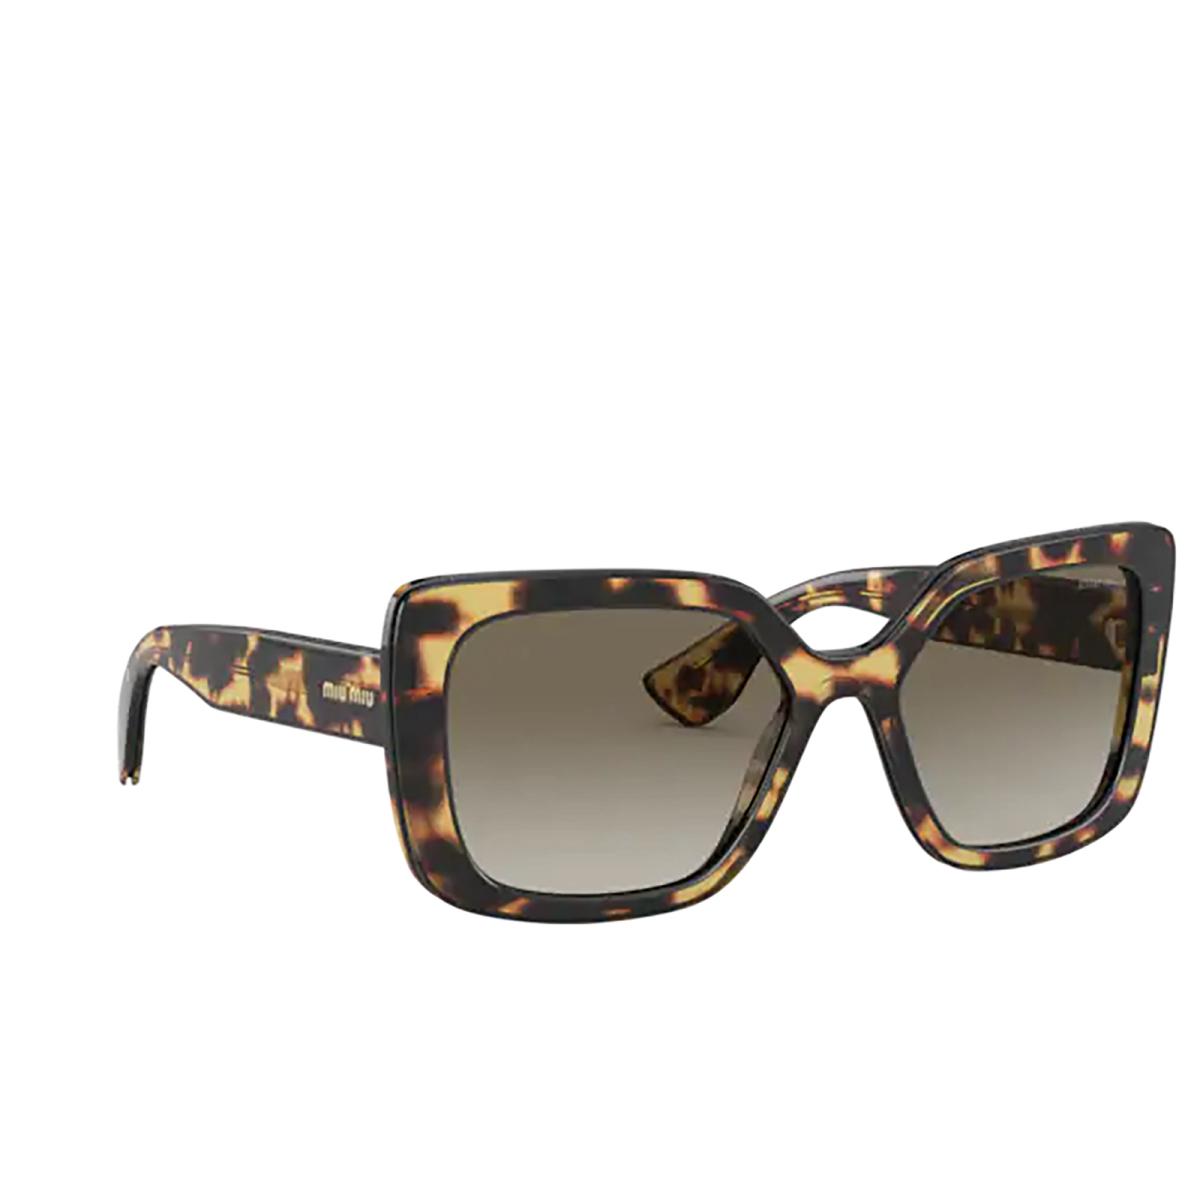 Miu Miu® Rectangle Sunglasses: MU 09VS color Havana 09H0A7.